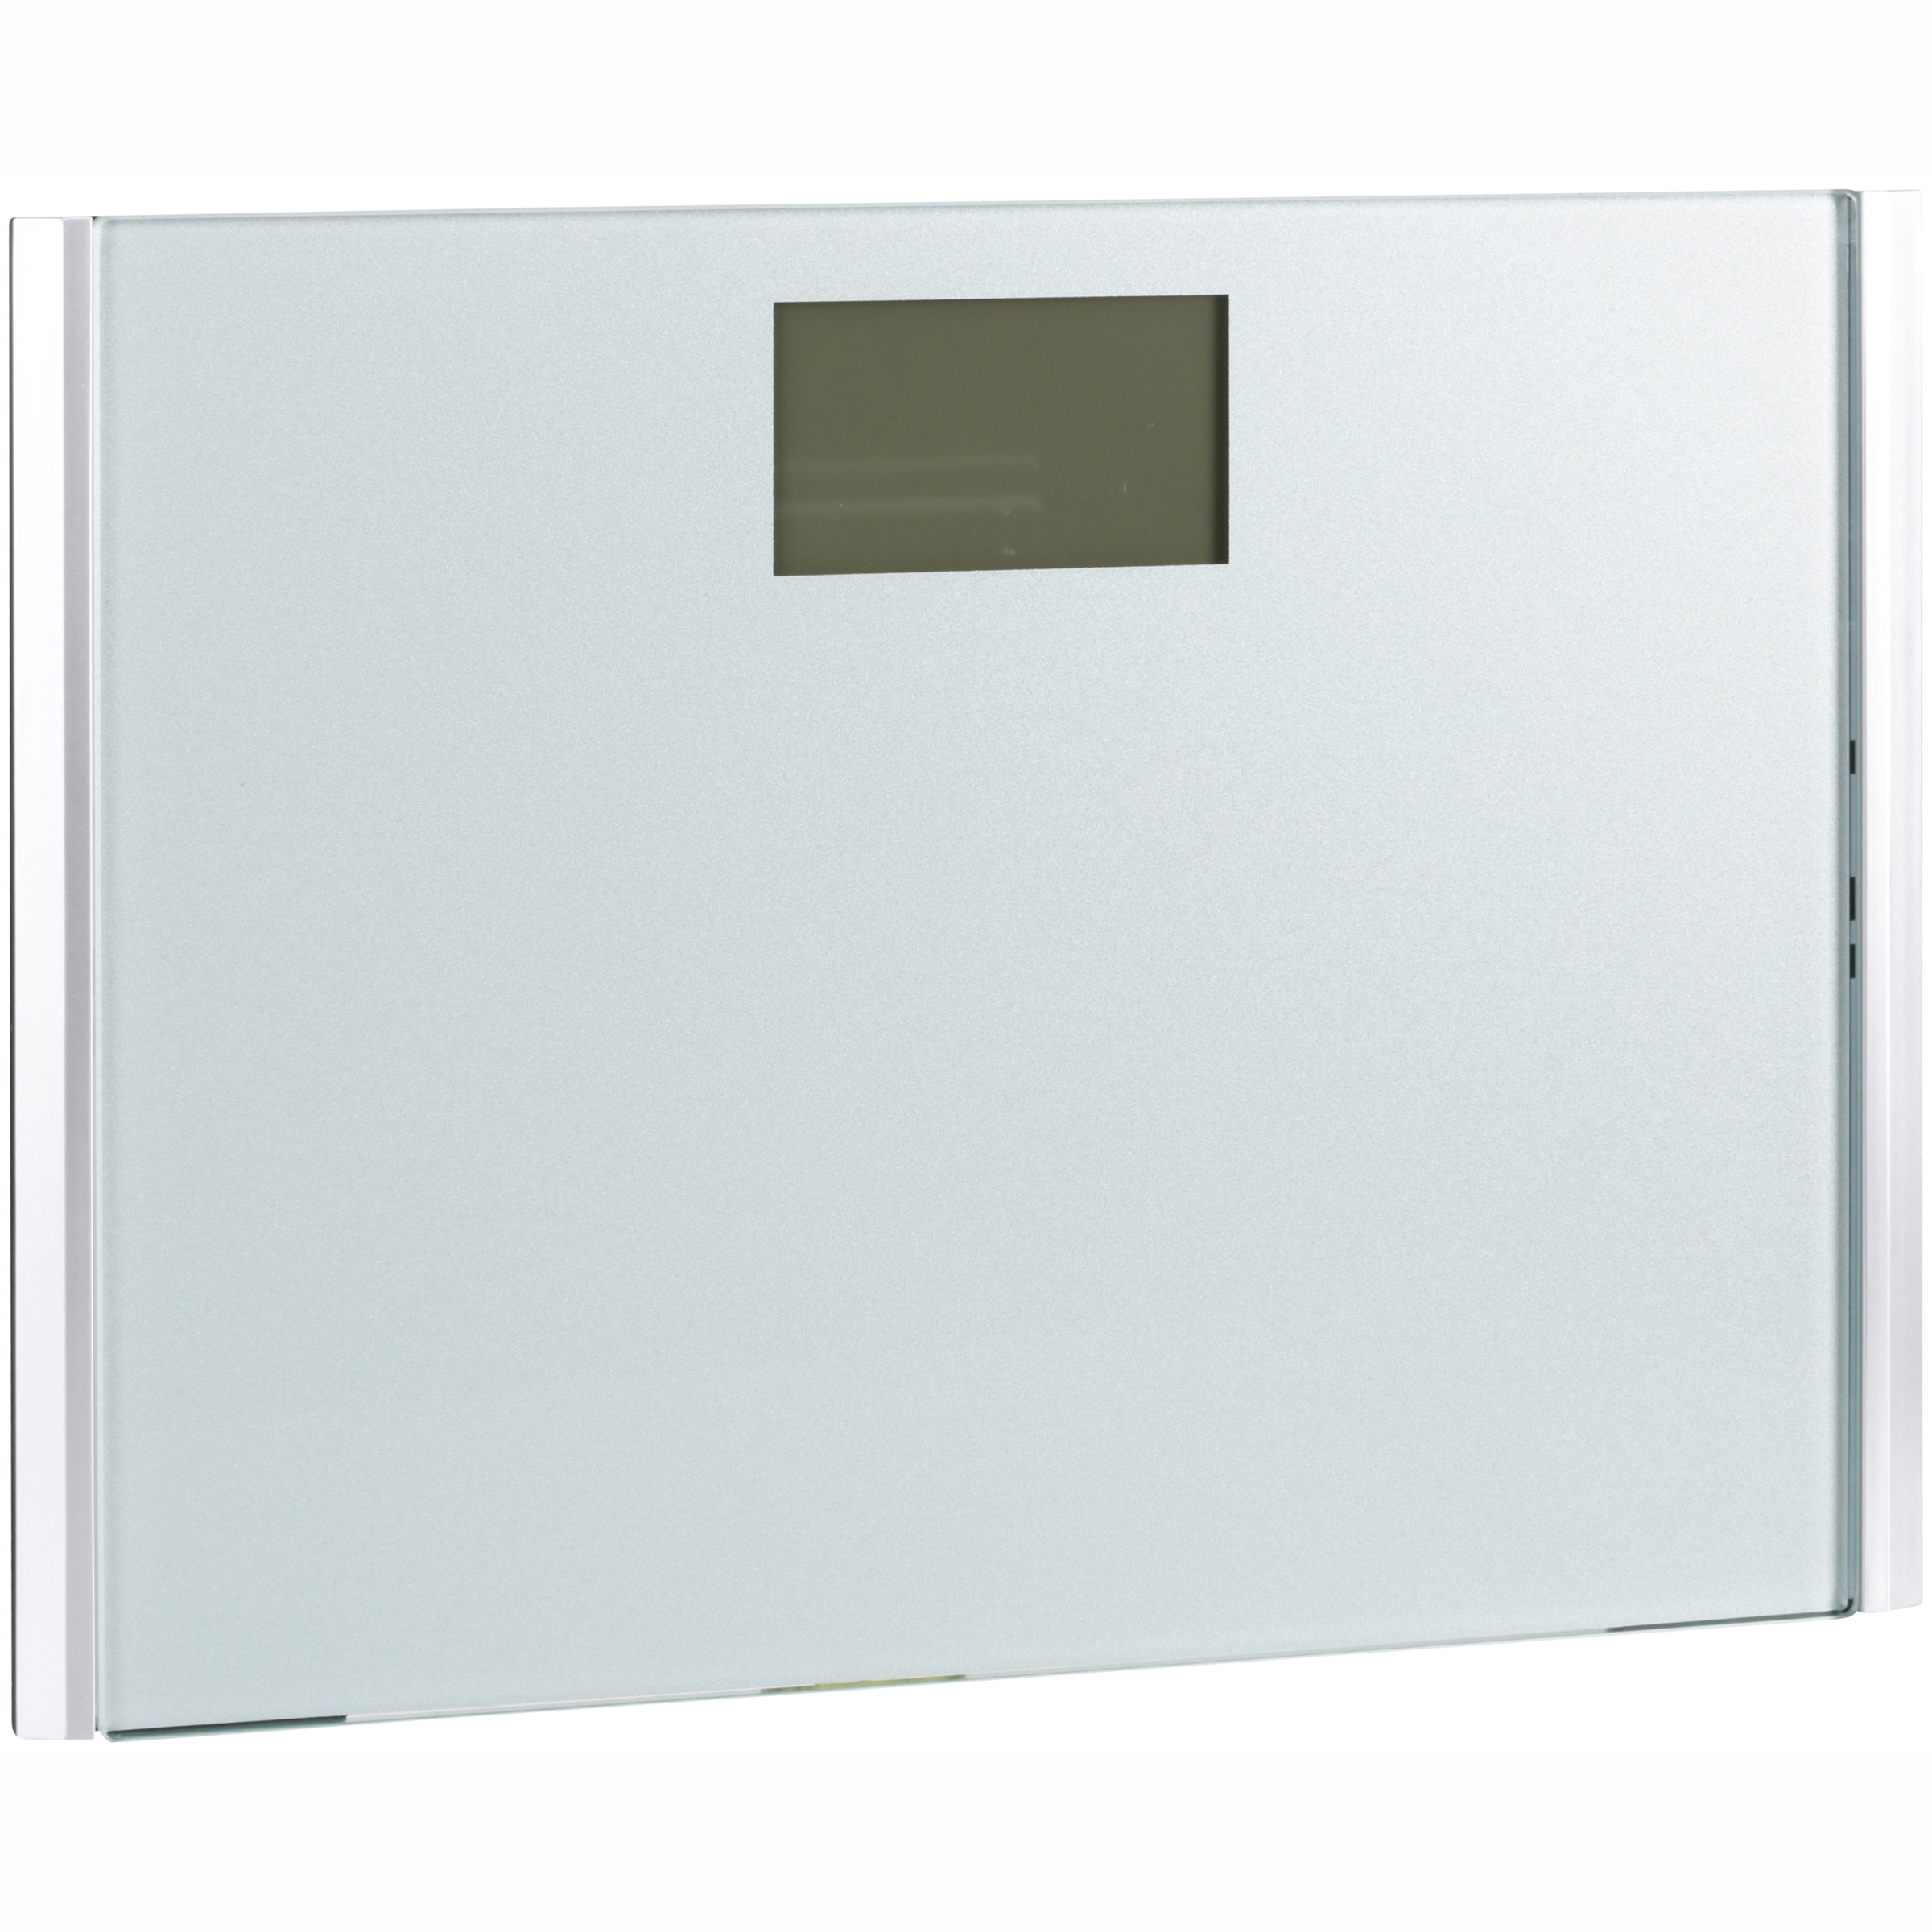 Hometrends Digital Bath Scale